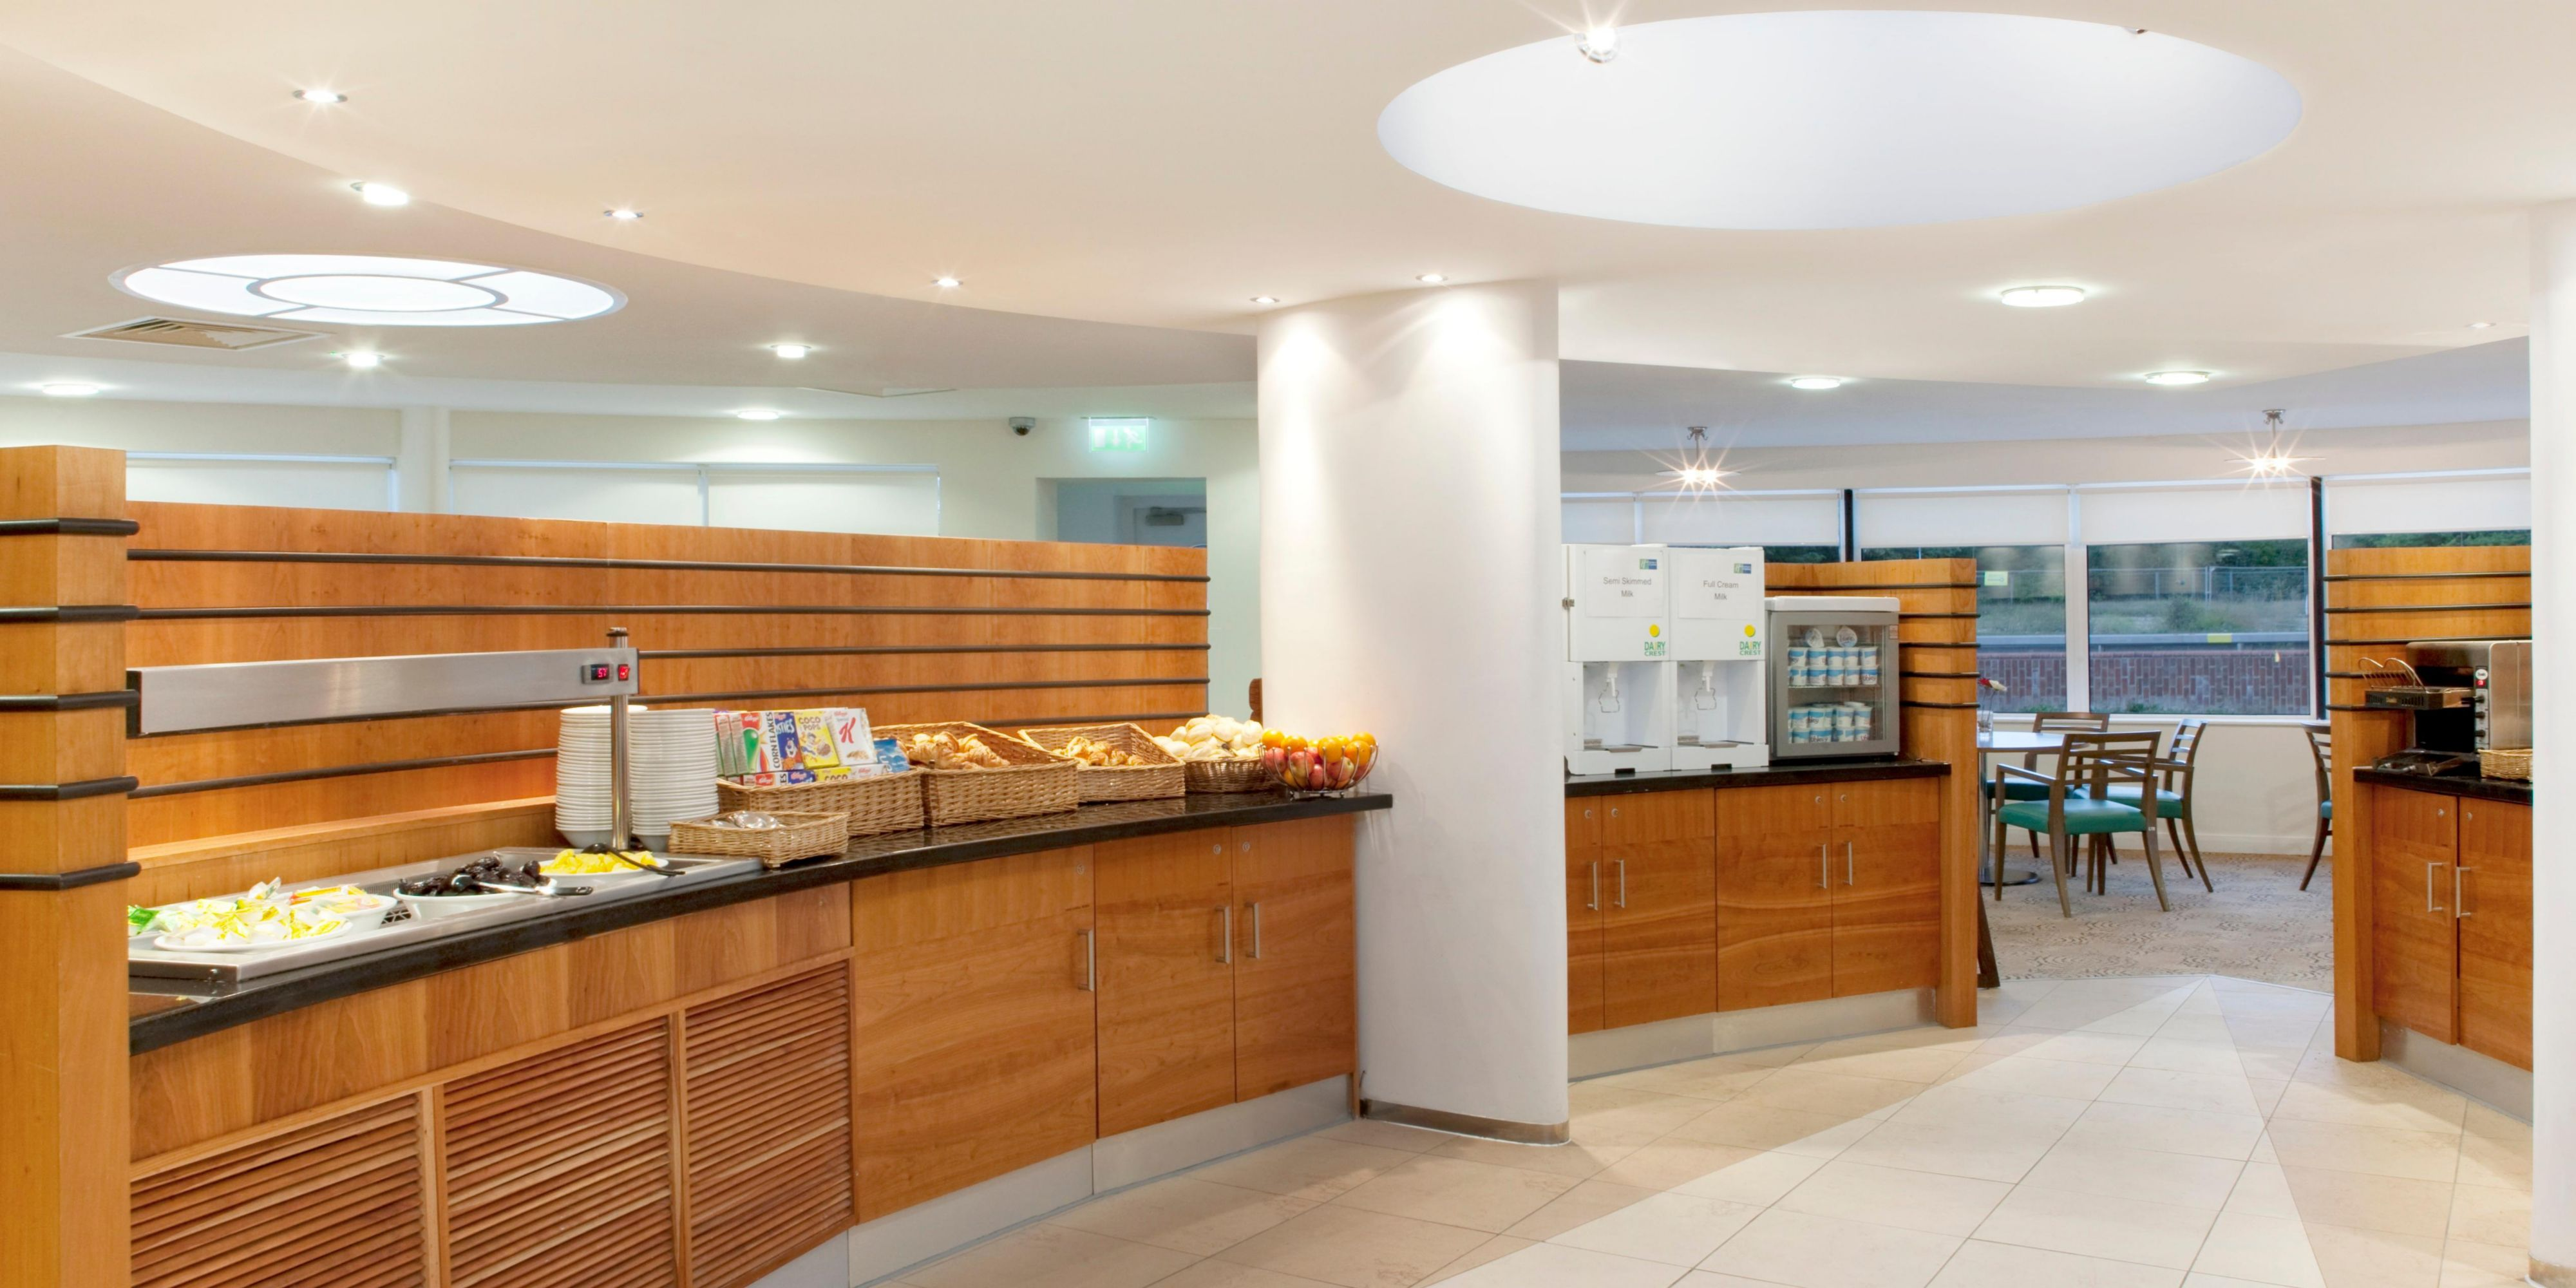 Ramsgate Hotels: Holiday Inn Express Ramsgate - Minster